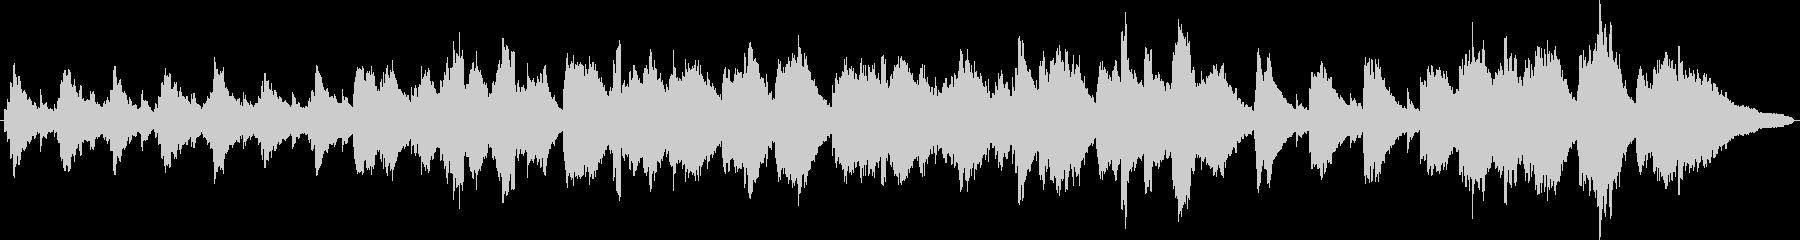 Sleepy Rhose 2の未再生の波形